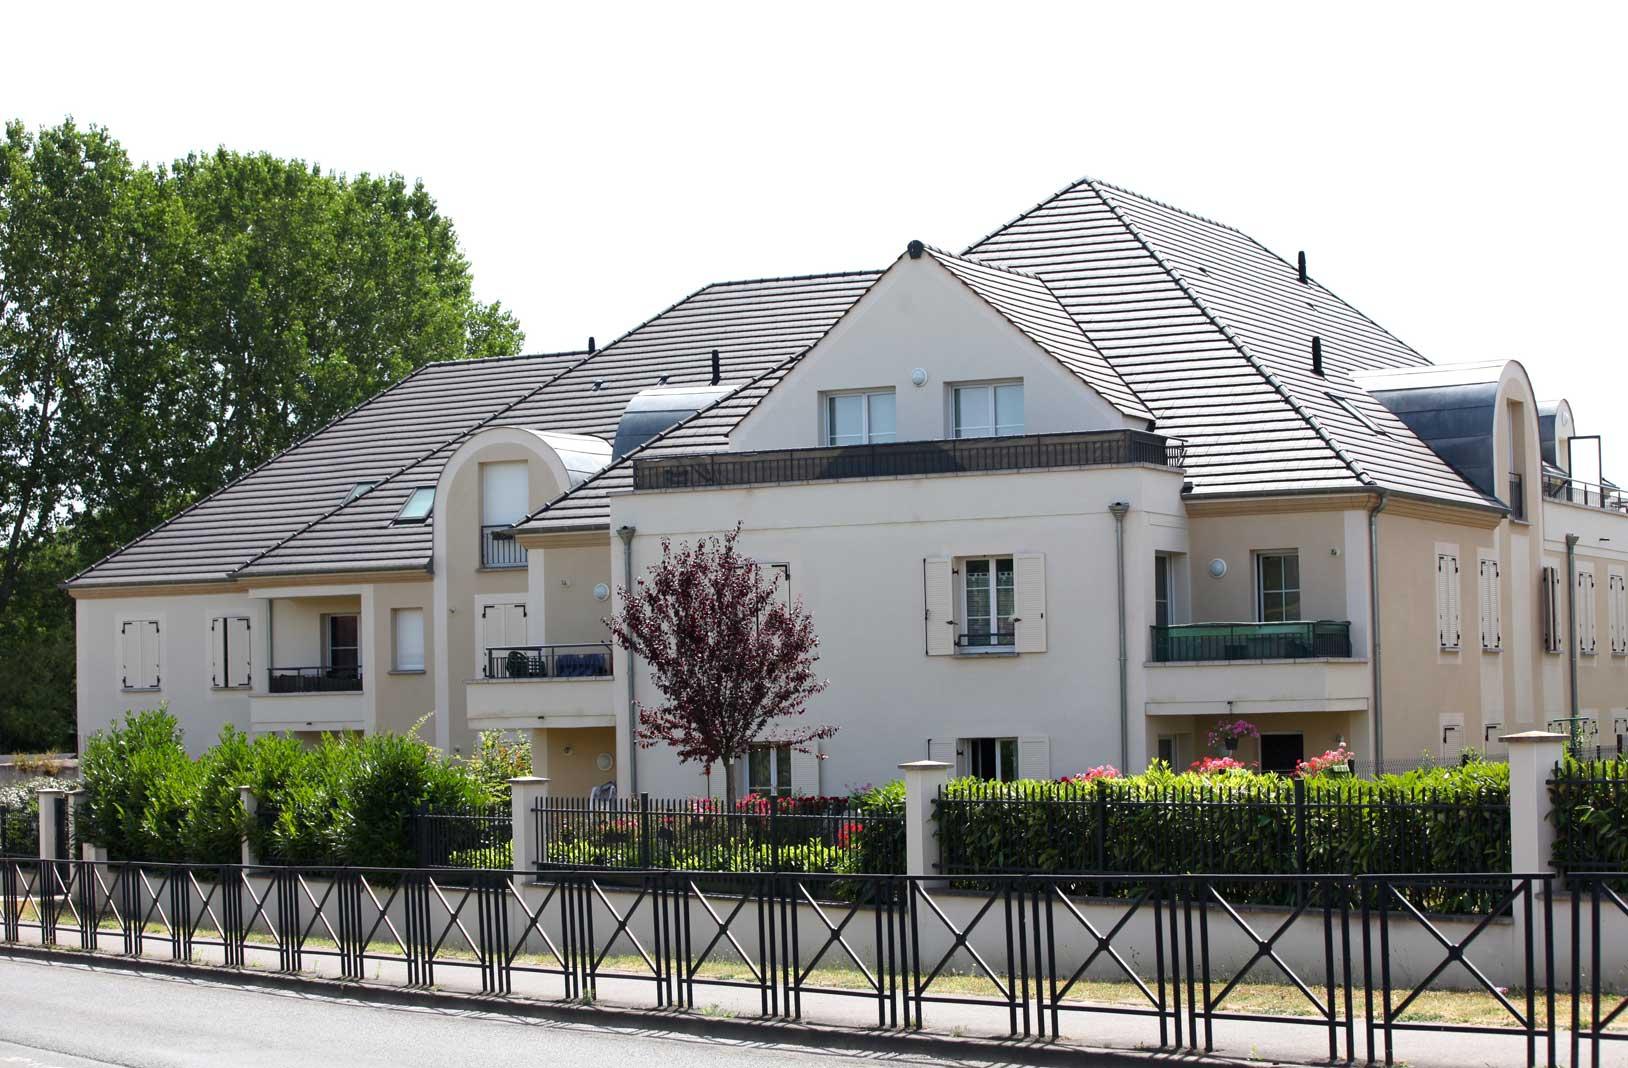 Residence_Clos_Saint_Louis_6